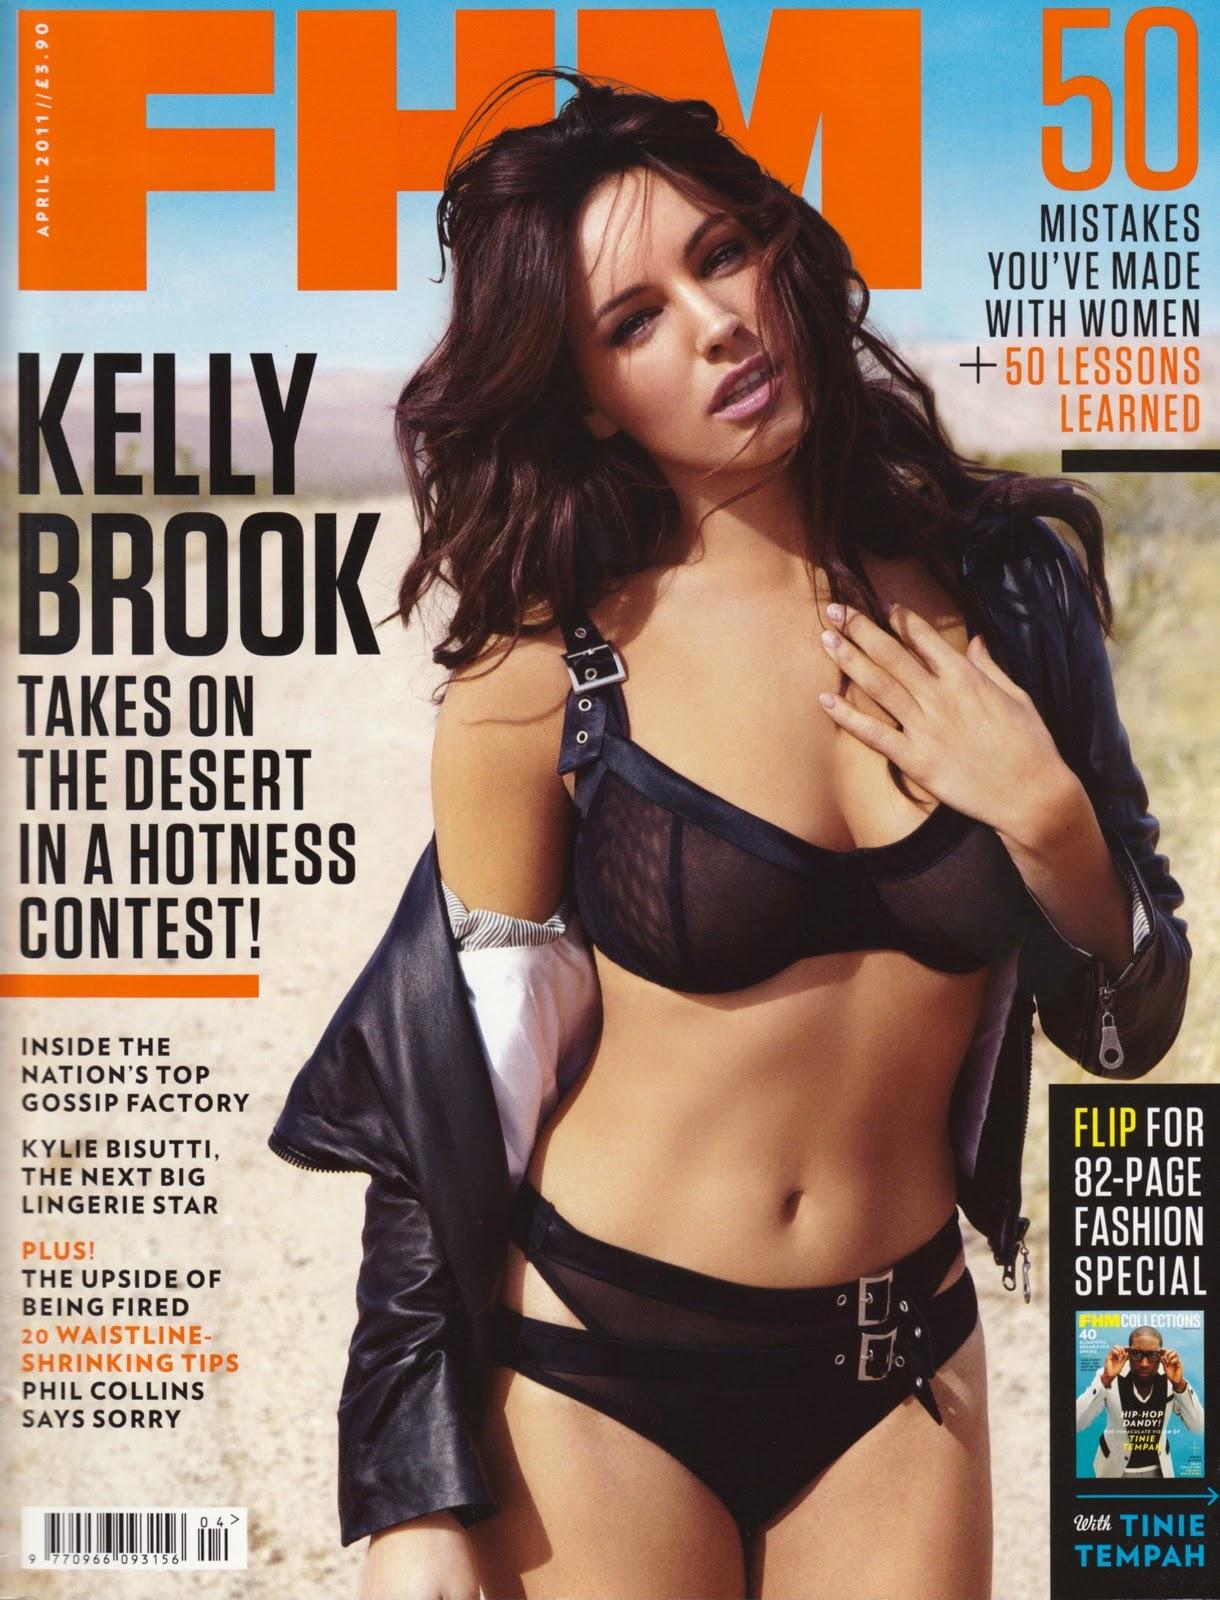 http://2.bp.blogspot.com/-Pu_Ci2Br0KM/TY9yGvixRAI/AAAAAAAAAso/6xSWT7s3ogk/s1600/BikiniGirlsTop-Kelly-Brook-00.jpg